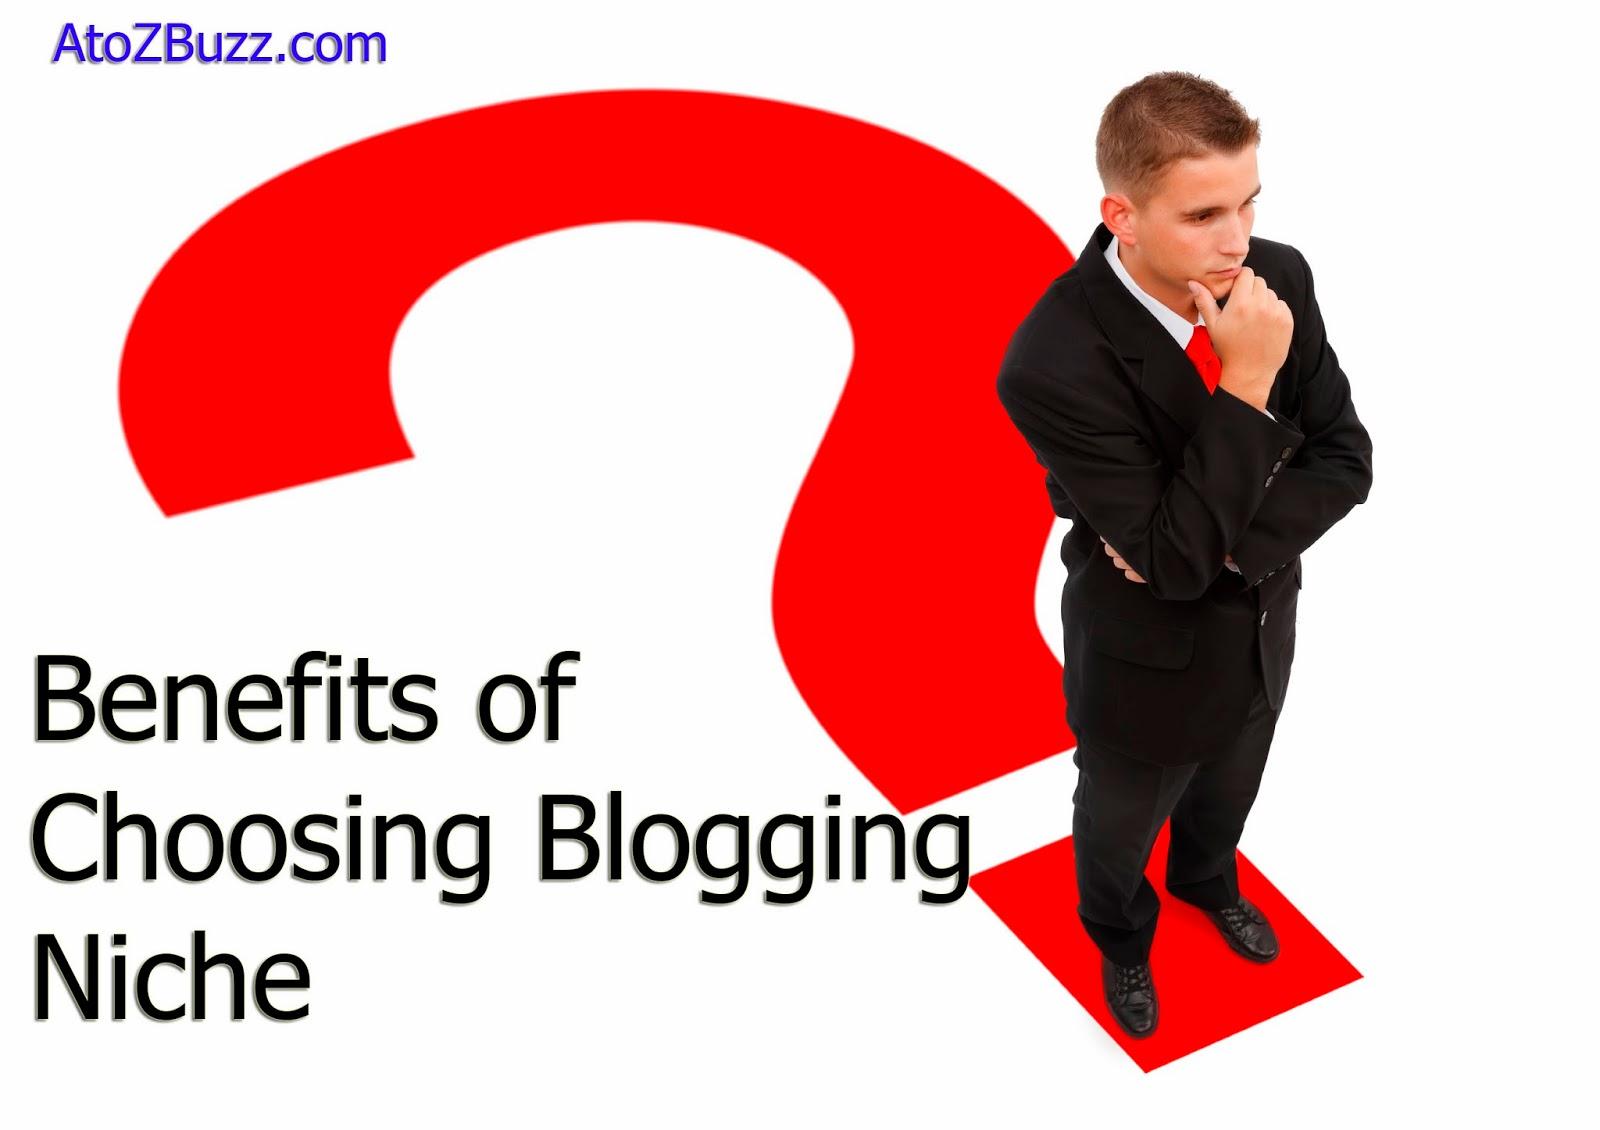 benefits+of+choosing+blogging+niche